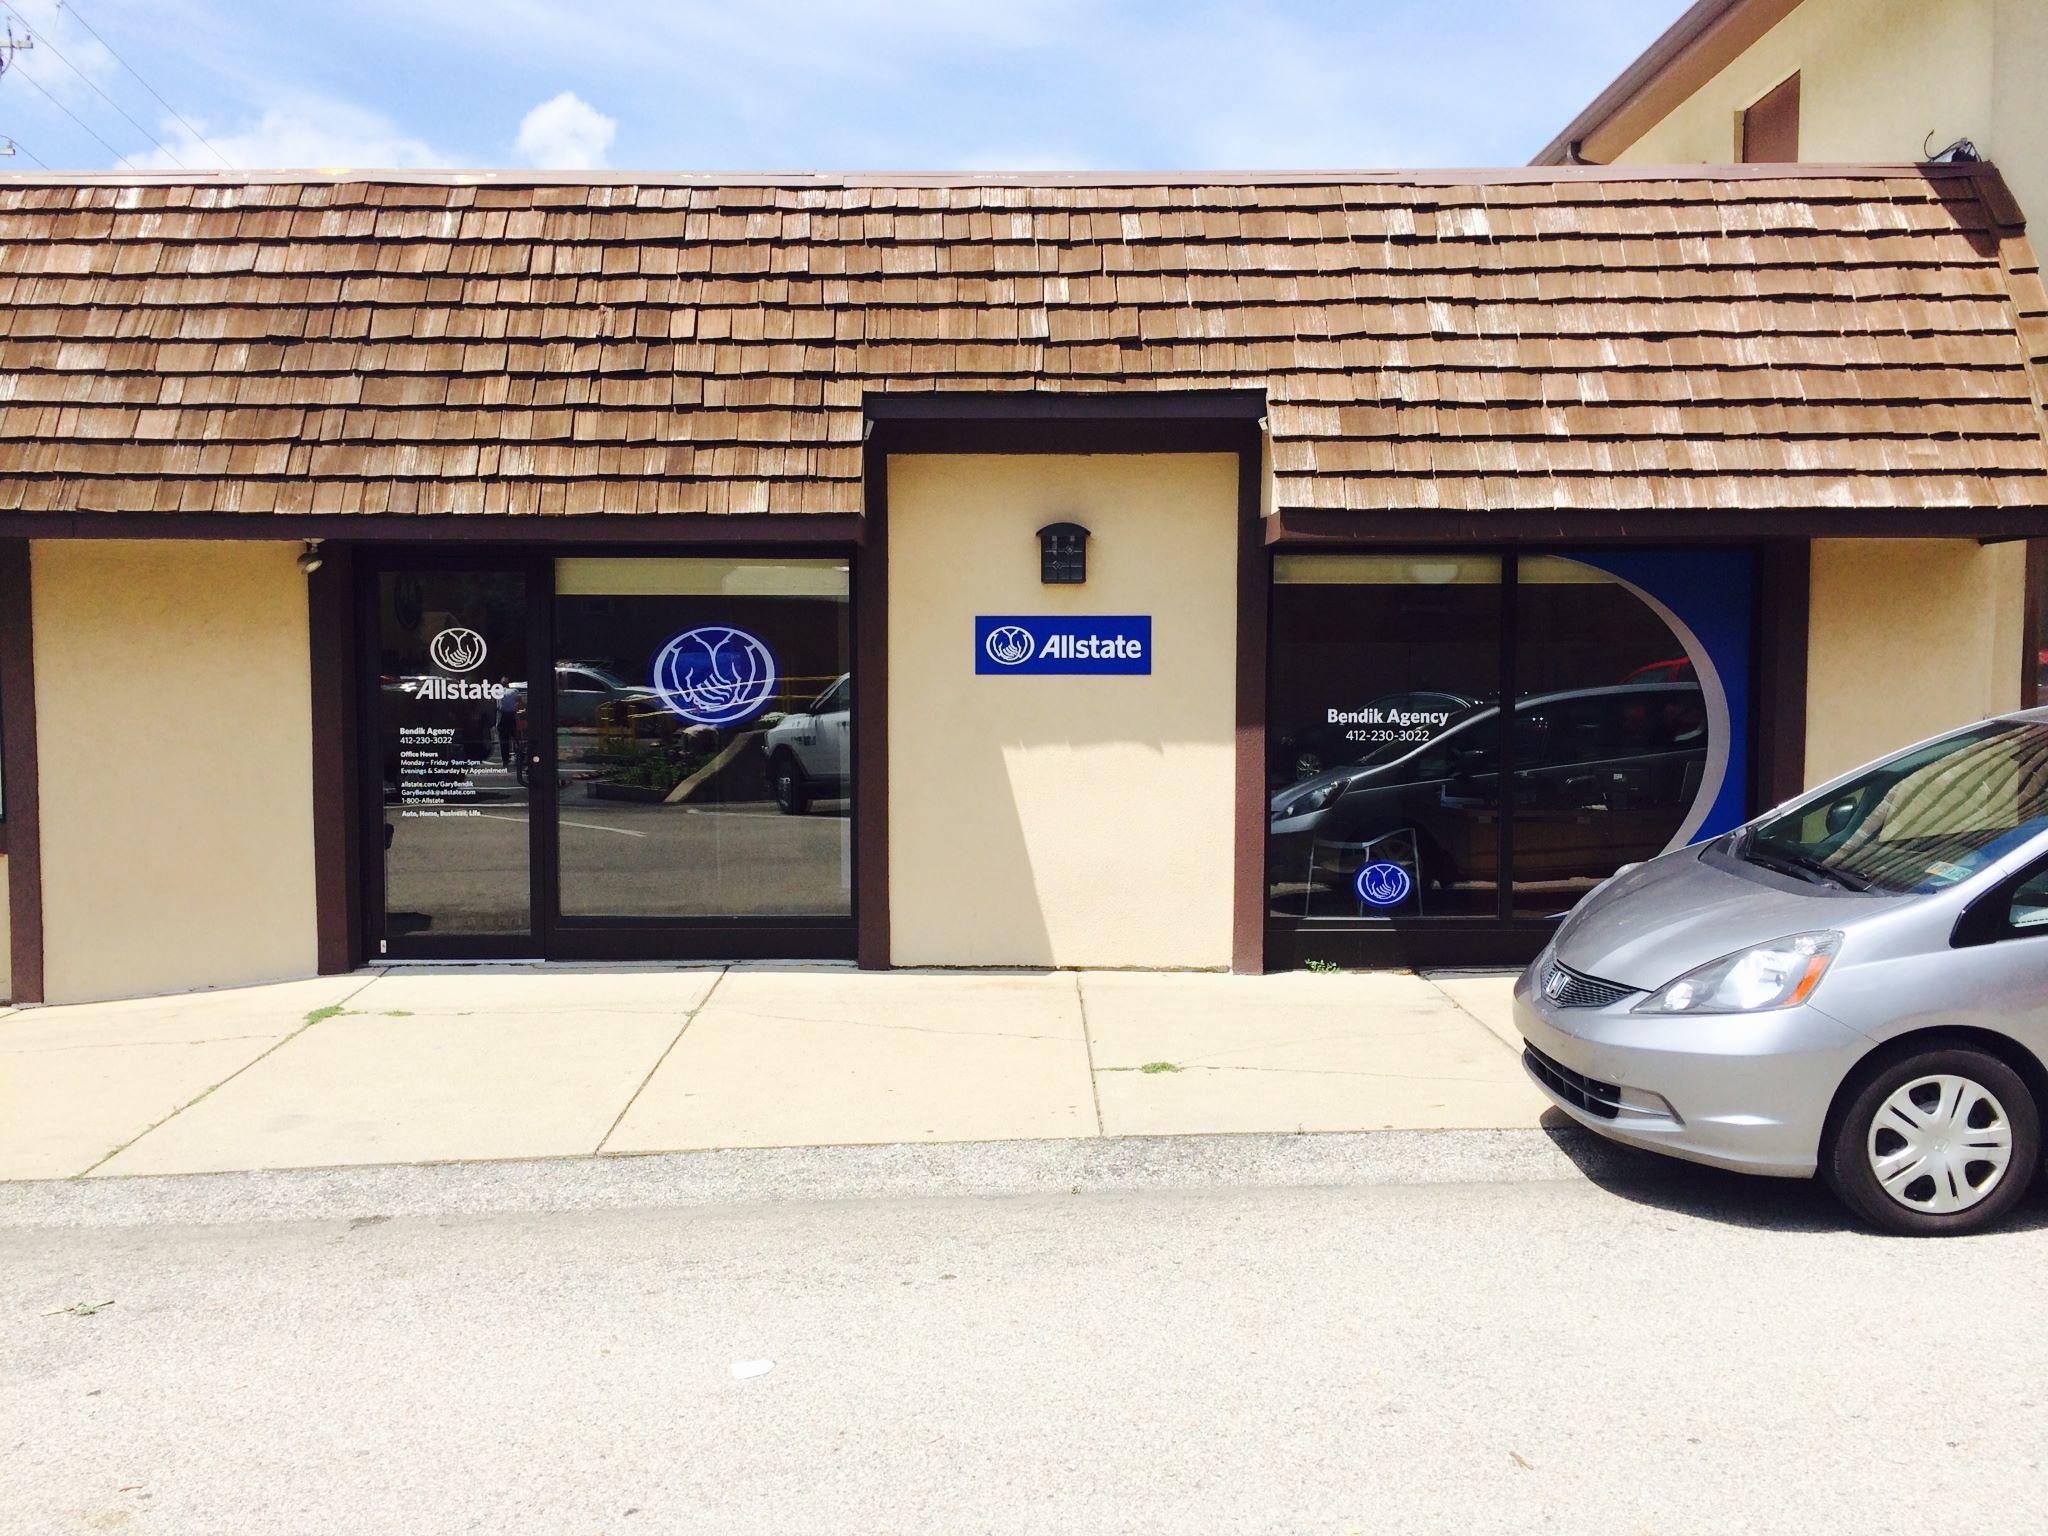 Gary Bendik: Allstate Insurance image 2